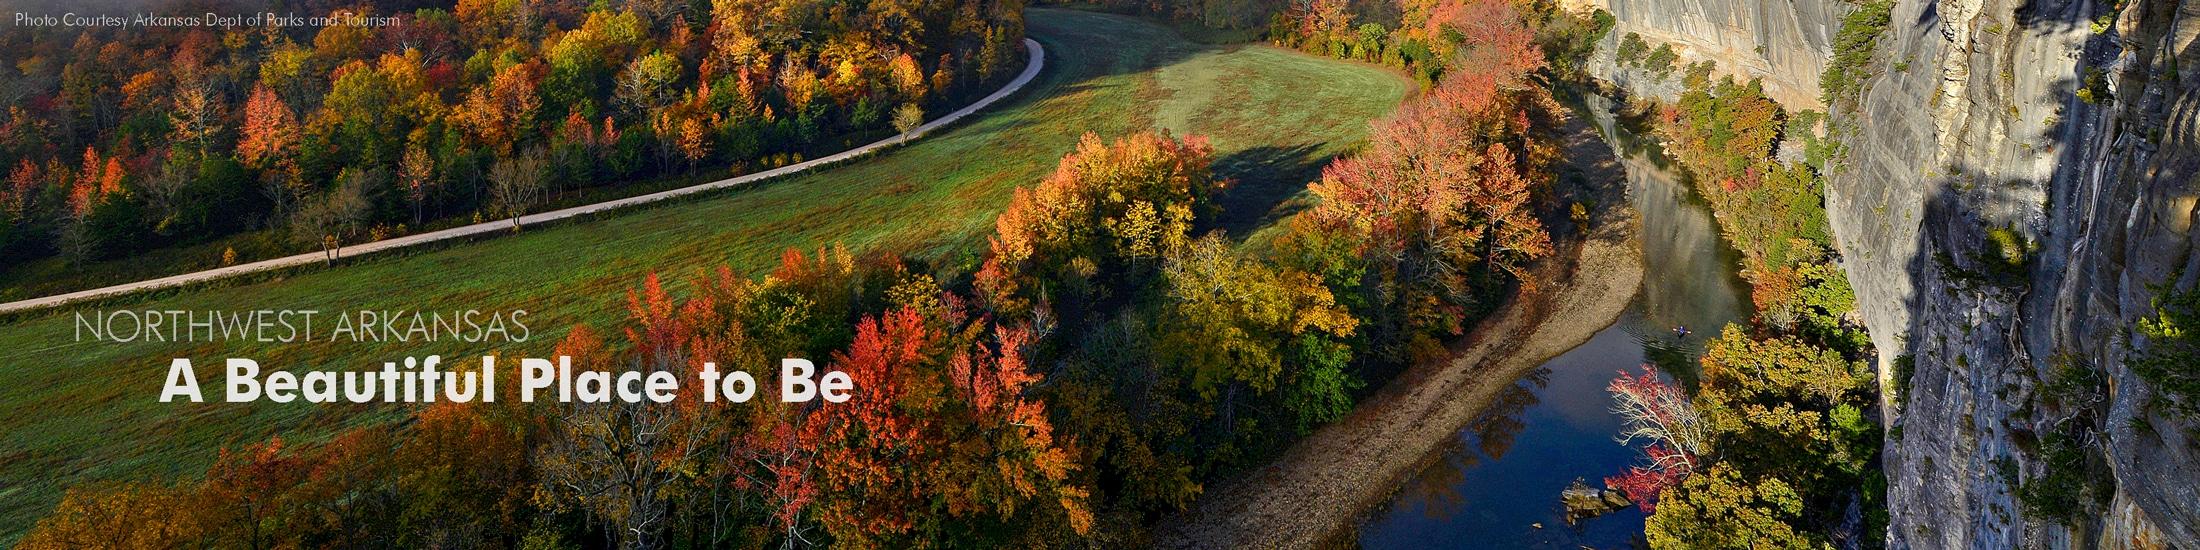 Northwest Arkansas Travel Guide Best Of Nwa Top 10